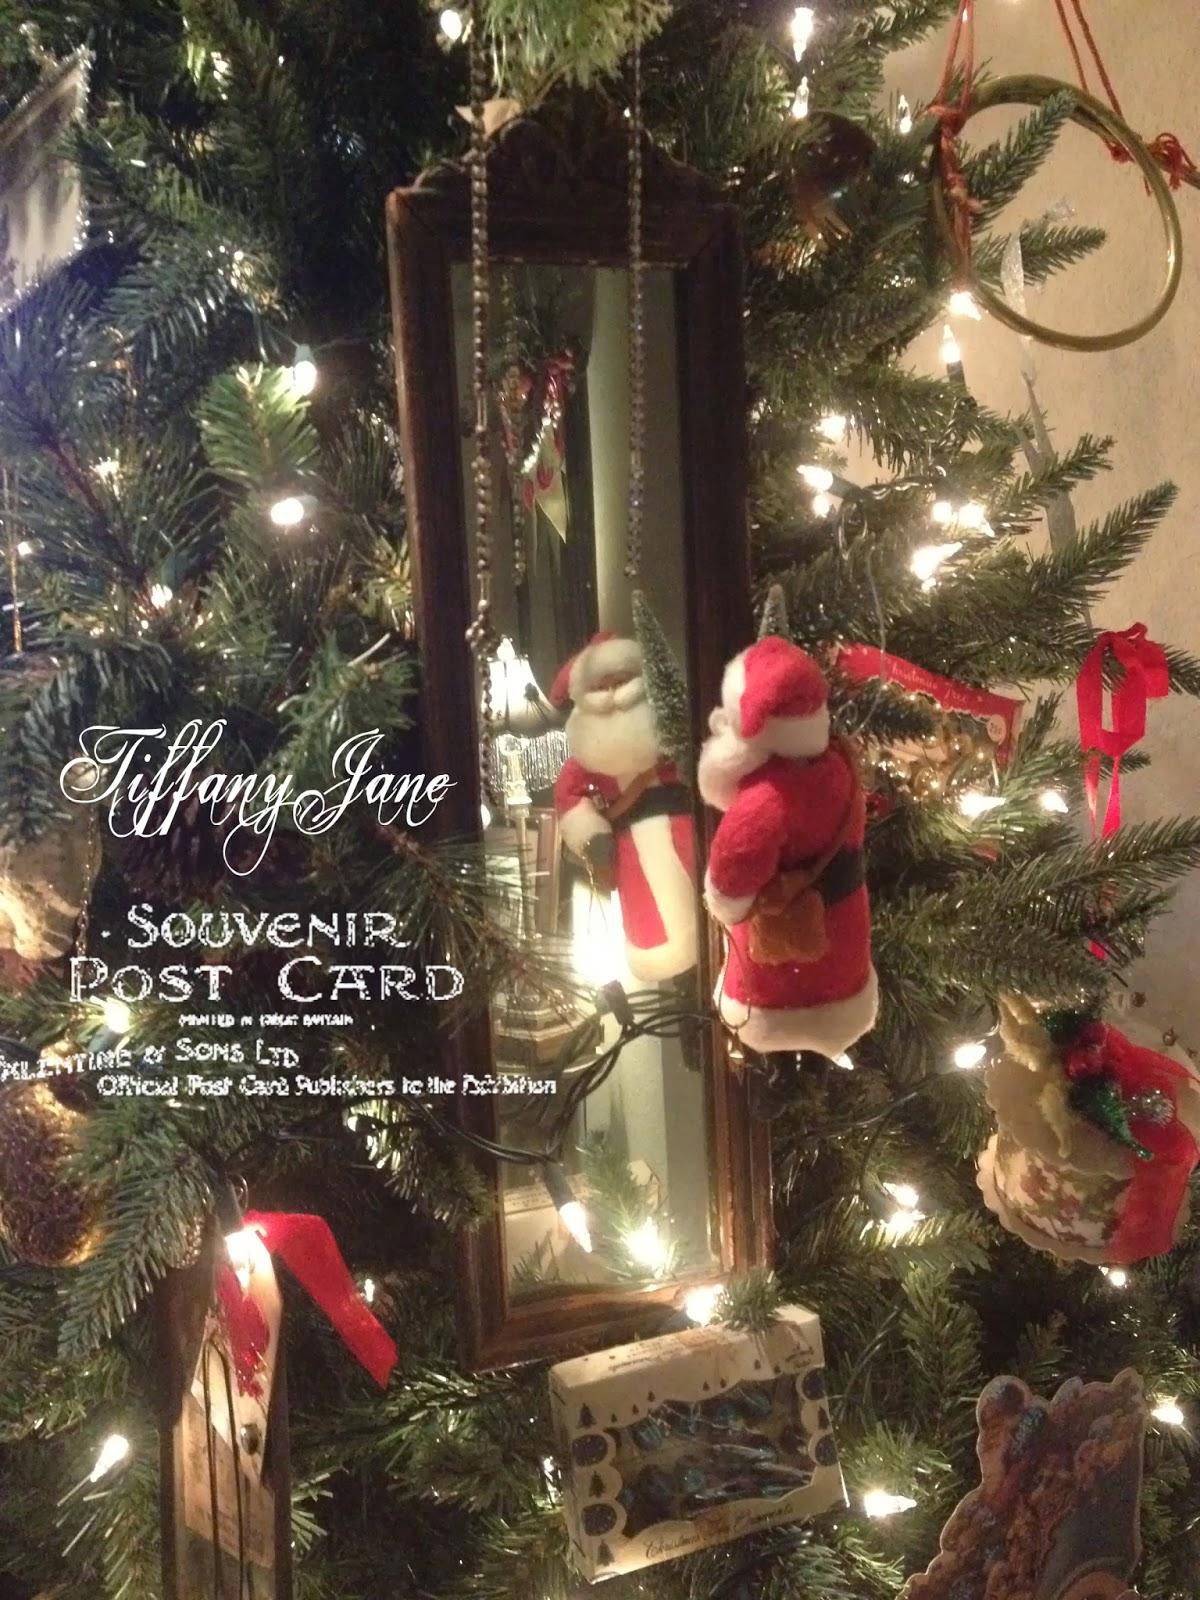 Tiffanyjane A Little Christmas Home Decor And